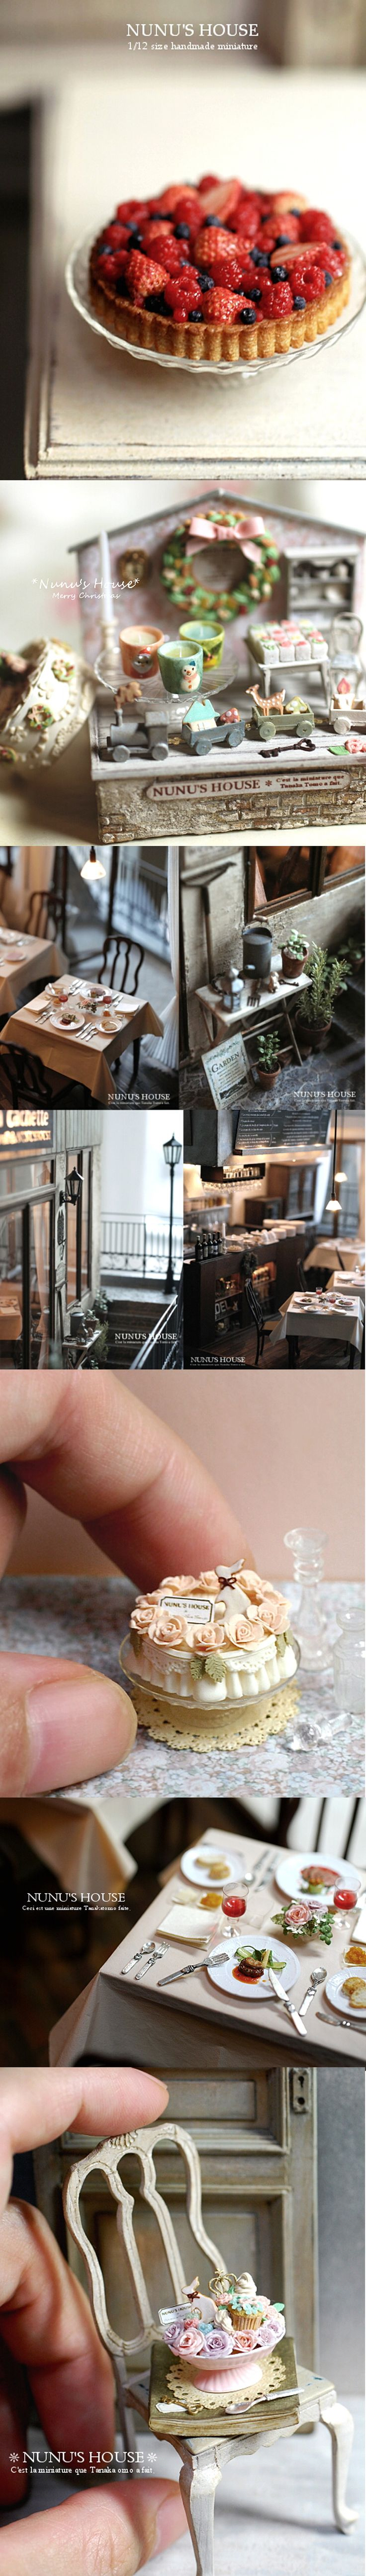 Nunu's House Miniatures. So realistic!!!!